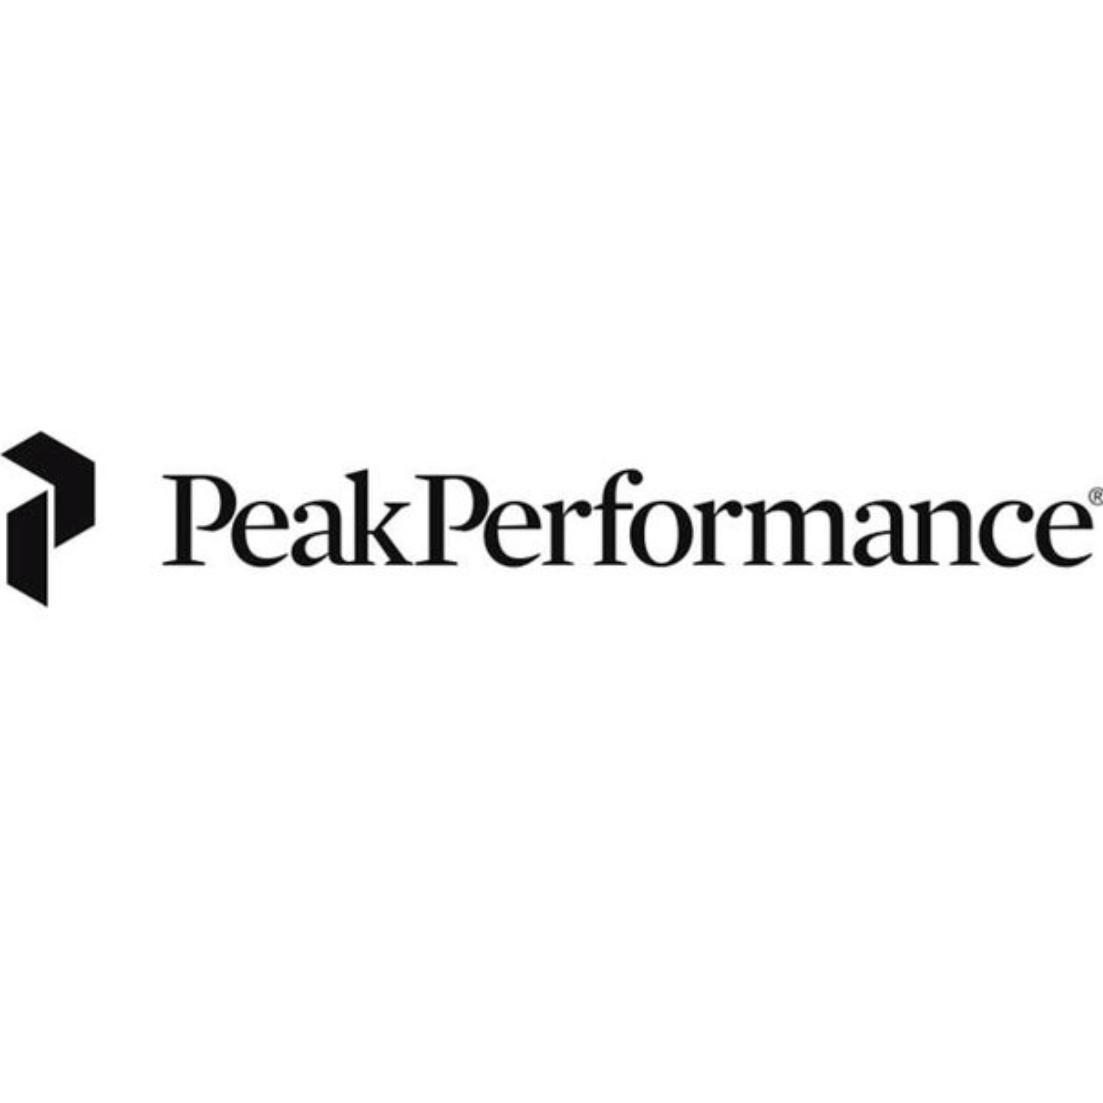 Peak Performance - Crans-Montana